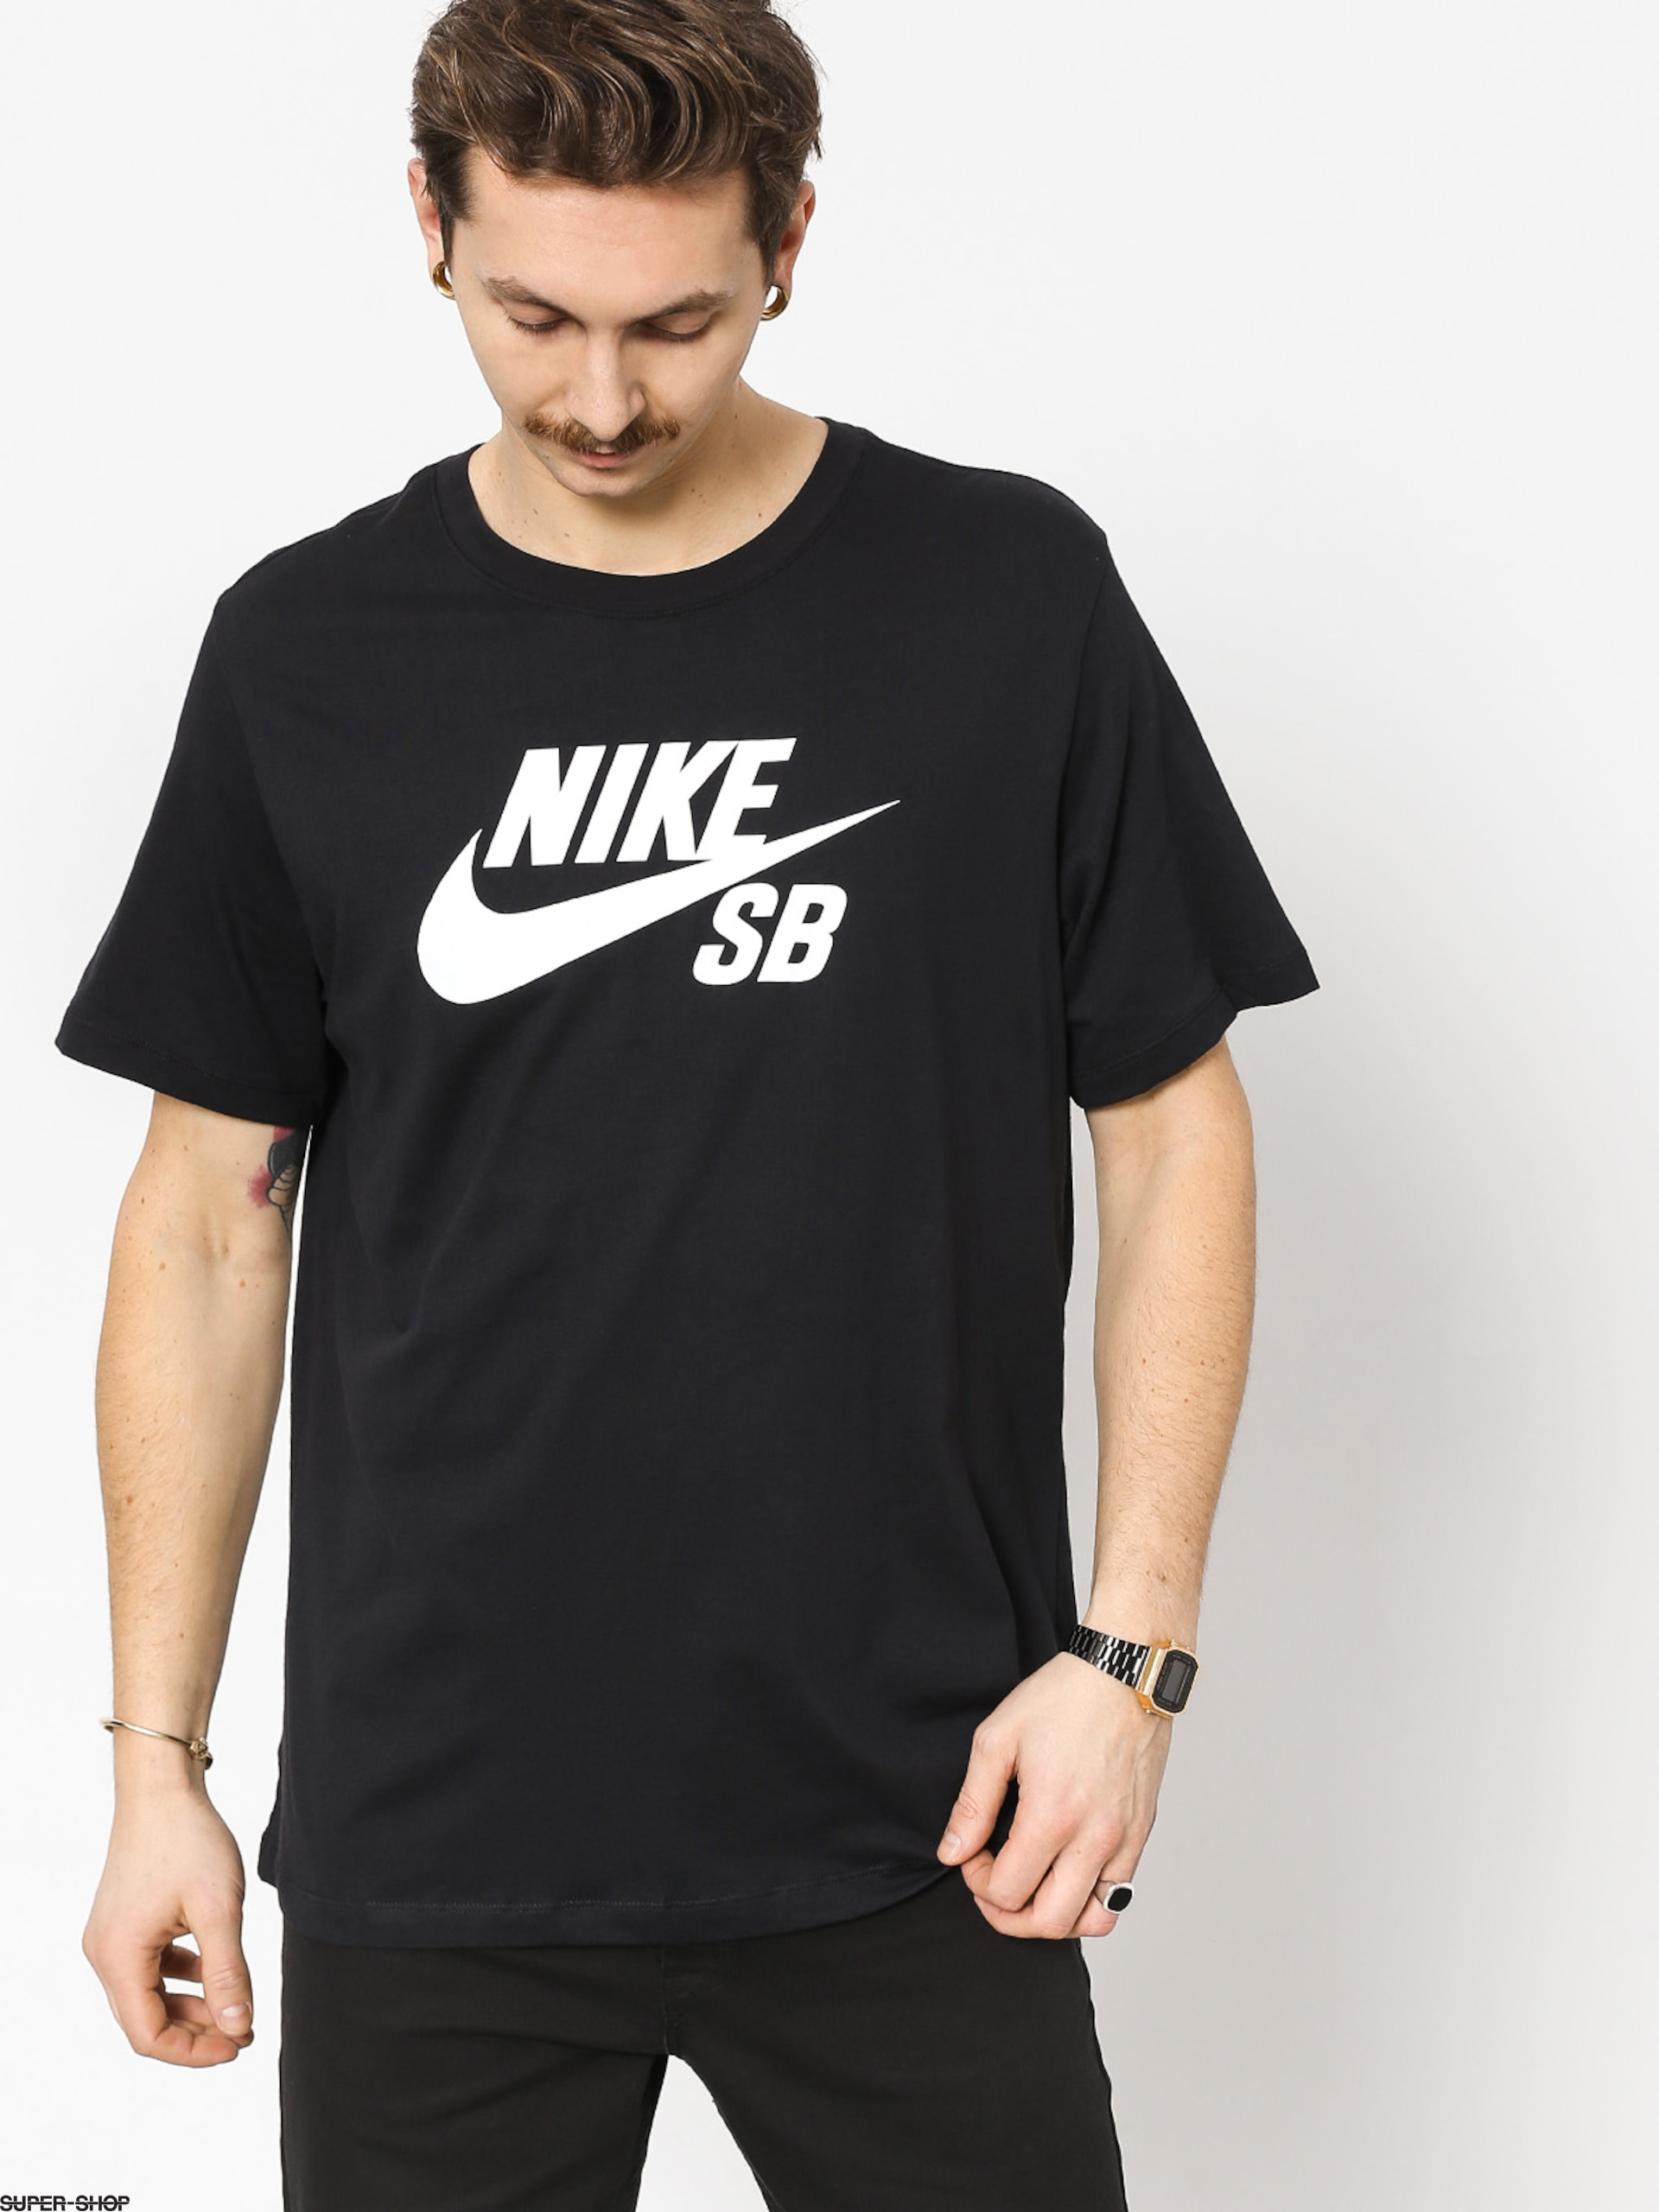 t shirt nike sb